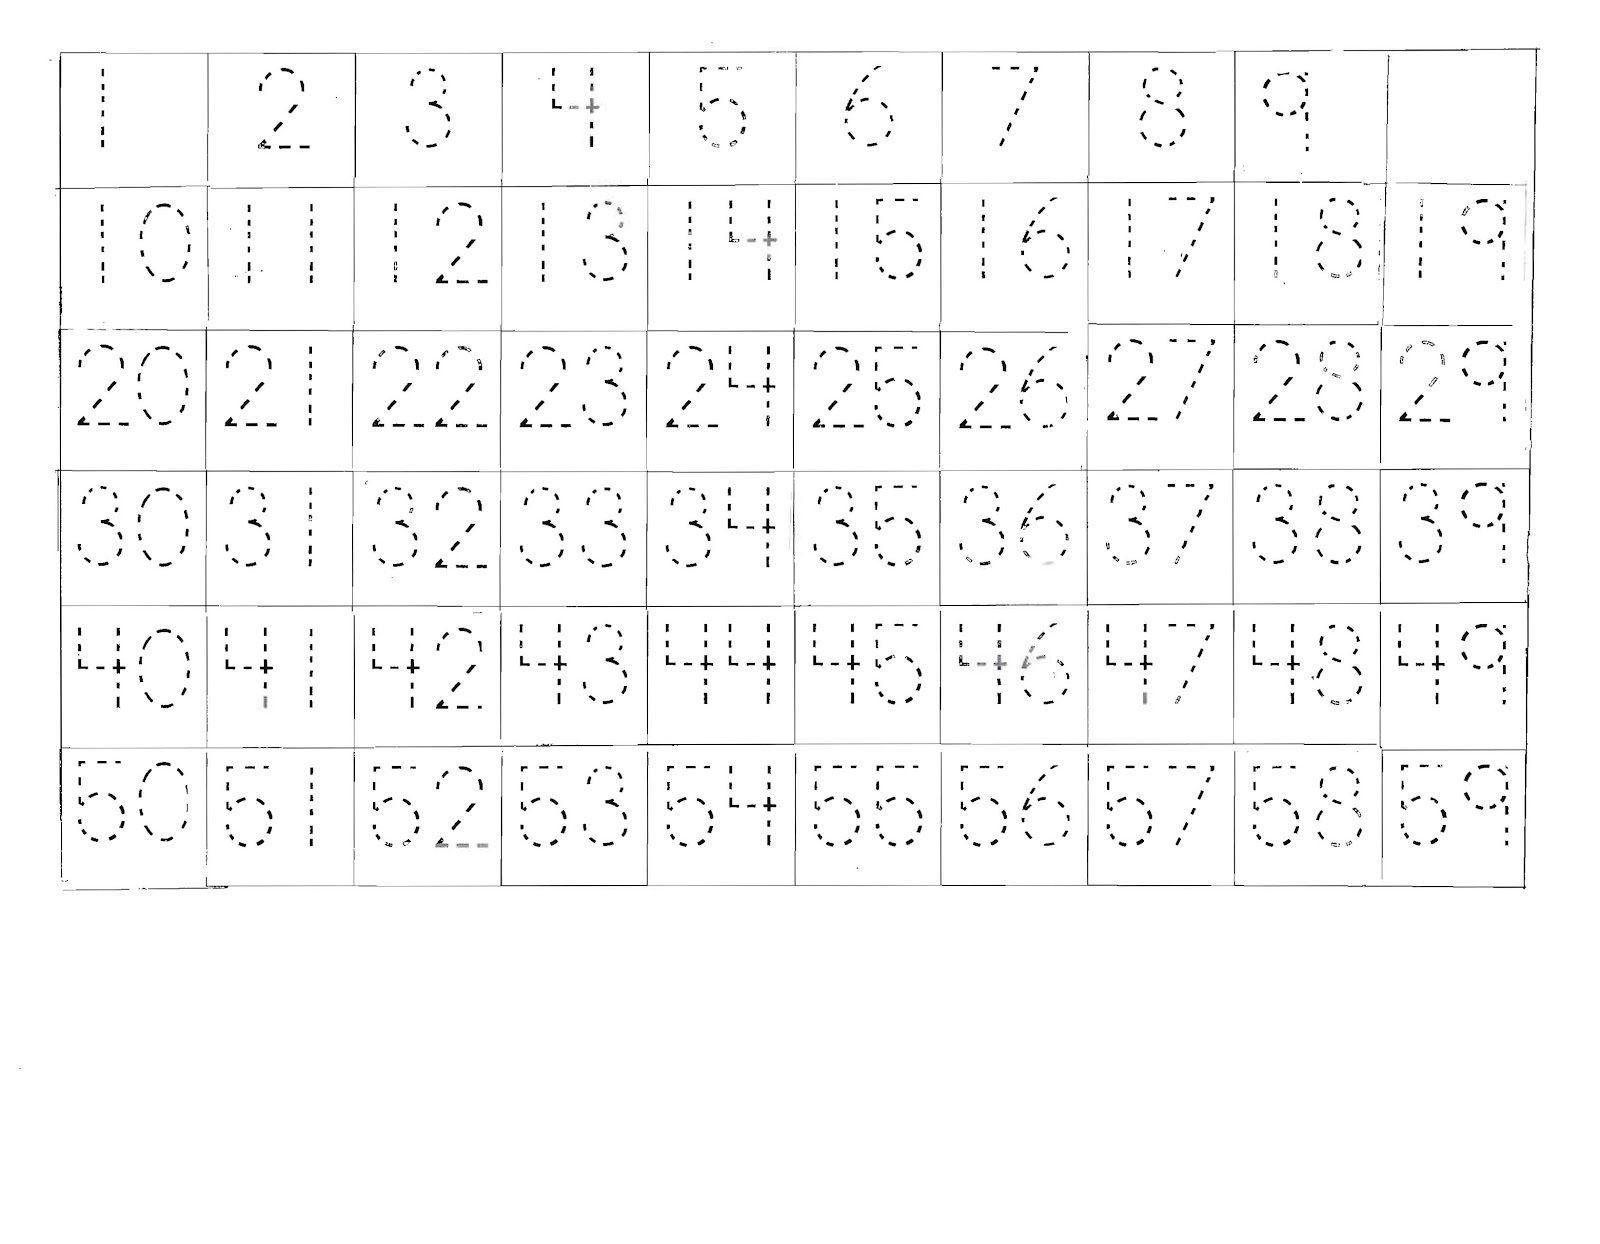 Number Sheet 1-100 to Print | Kids Worksheets Printable ...